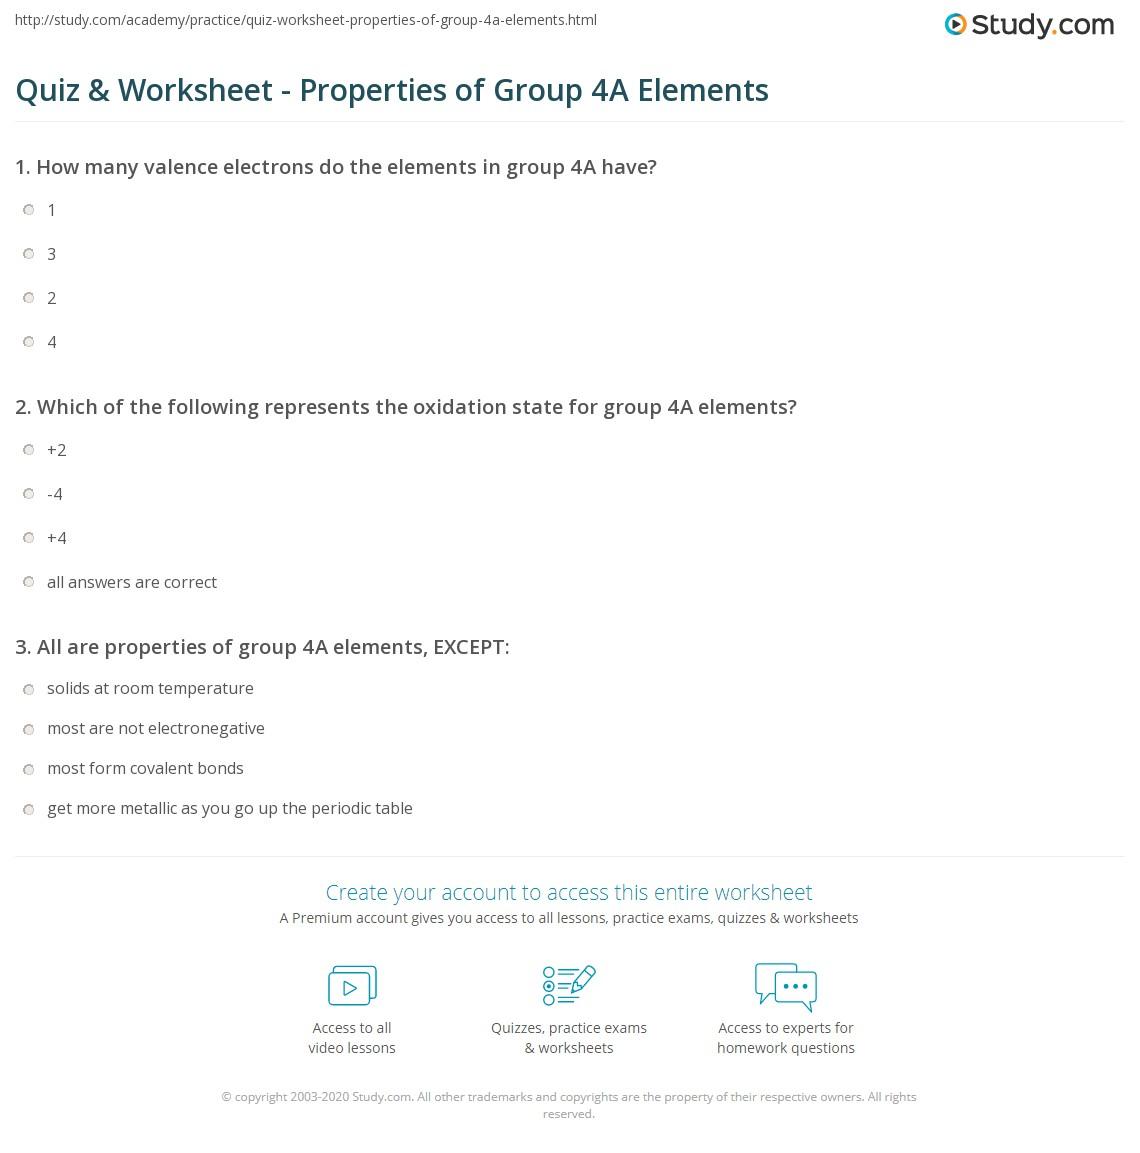 quiz worksheet properties of group 4a elements. Black Bedroom Furniture Sets. Home Design Ideas